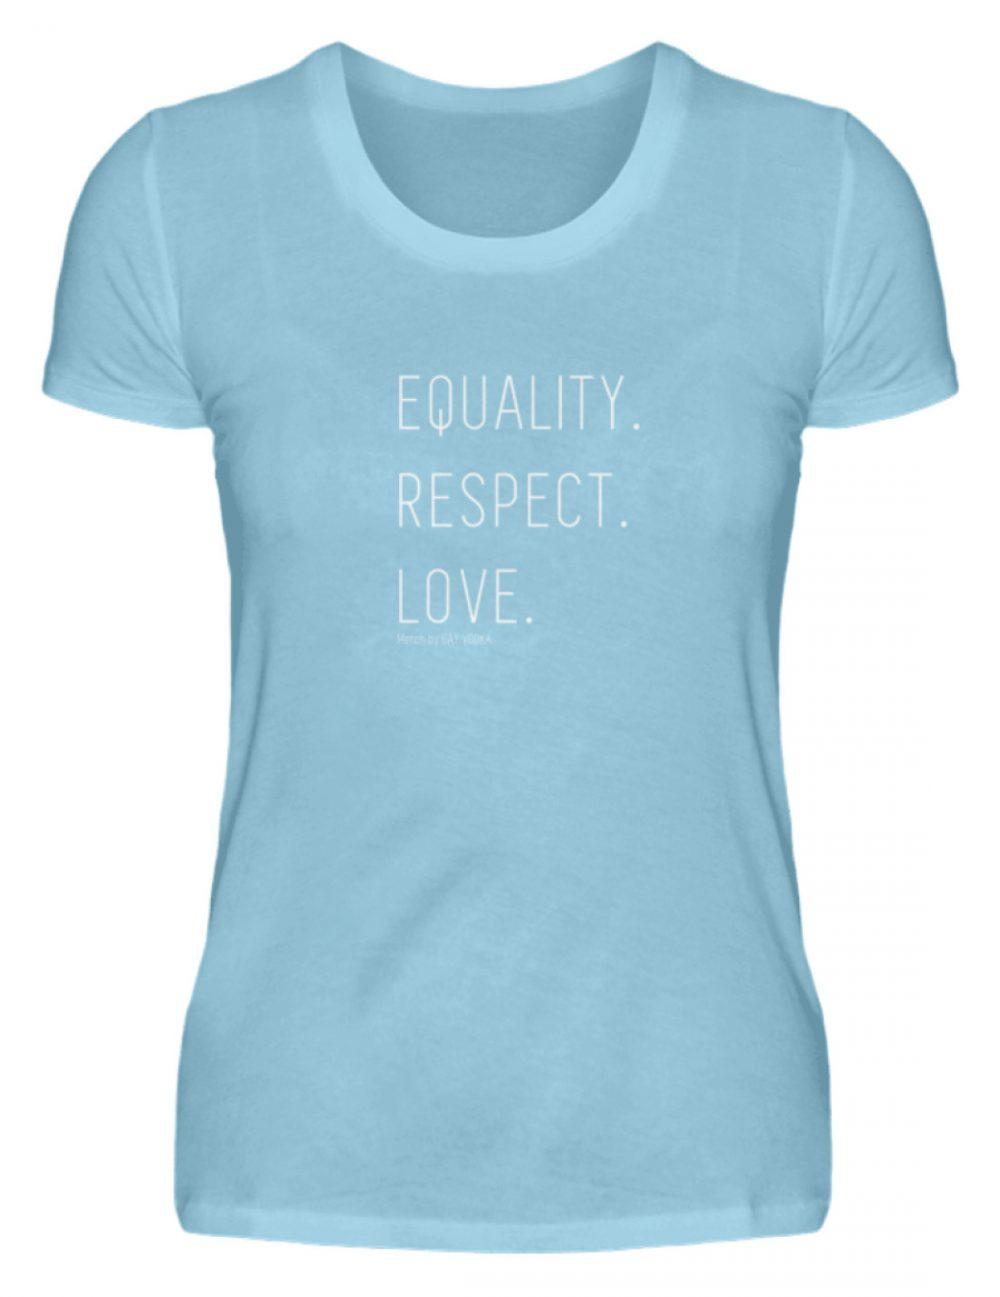 EQUALITY. RESPECT. LOVE. - Damen Premiumshirt-674